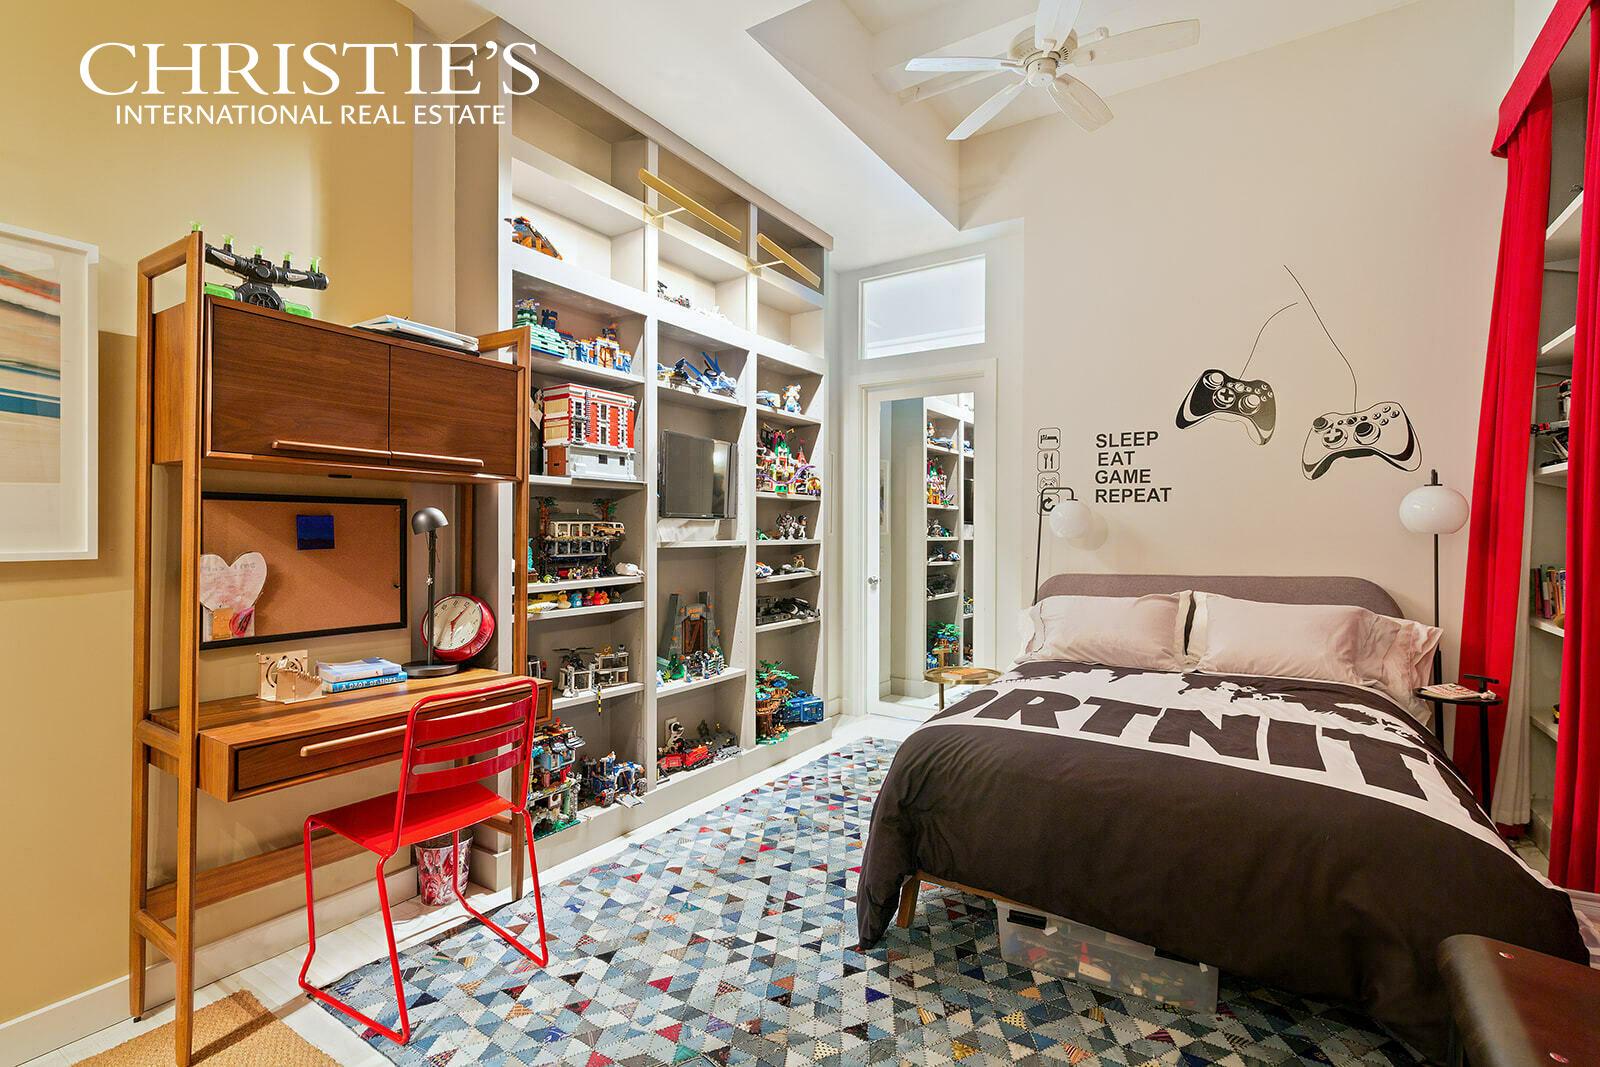 32 West 20th Street Flatiron District New York NY 10011